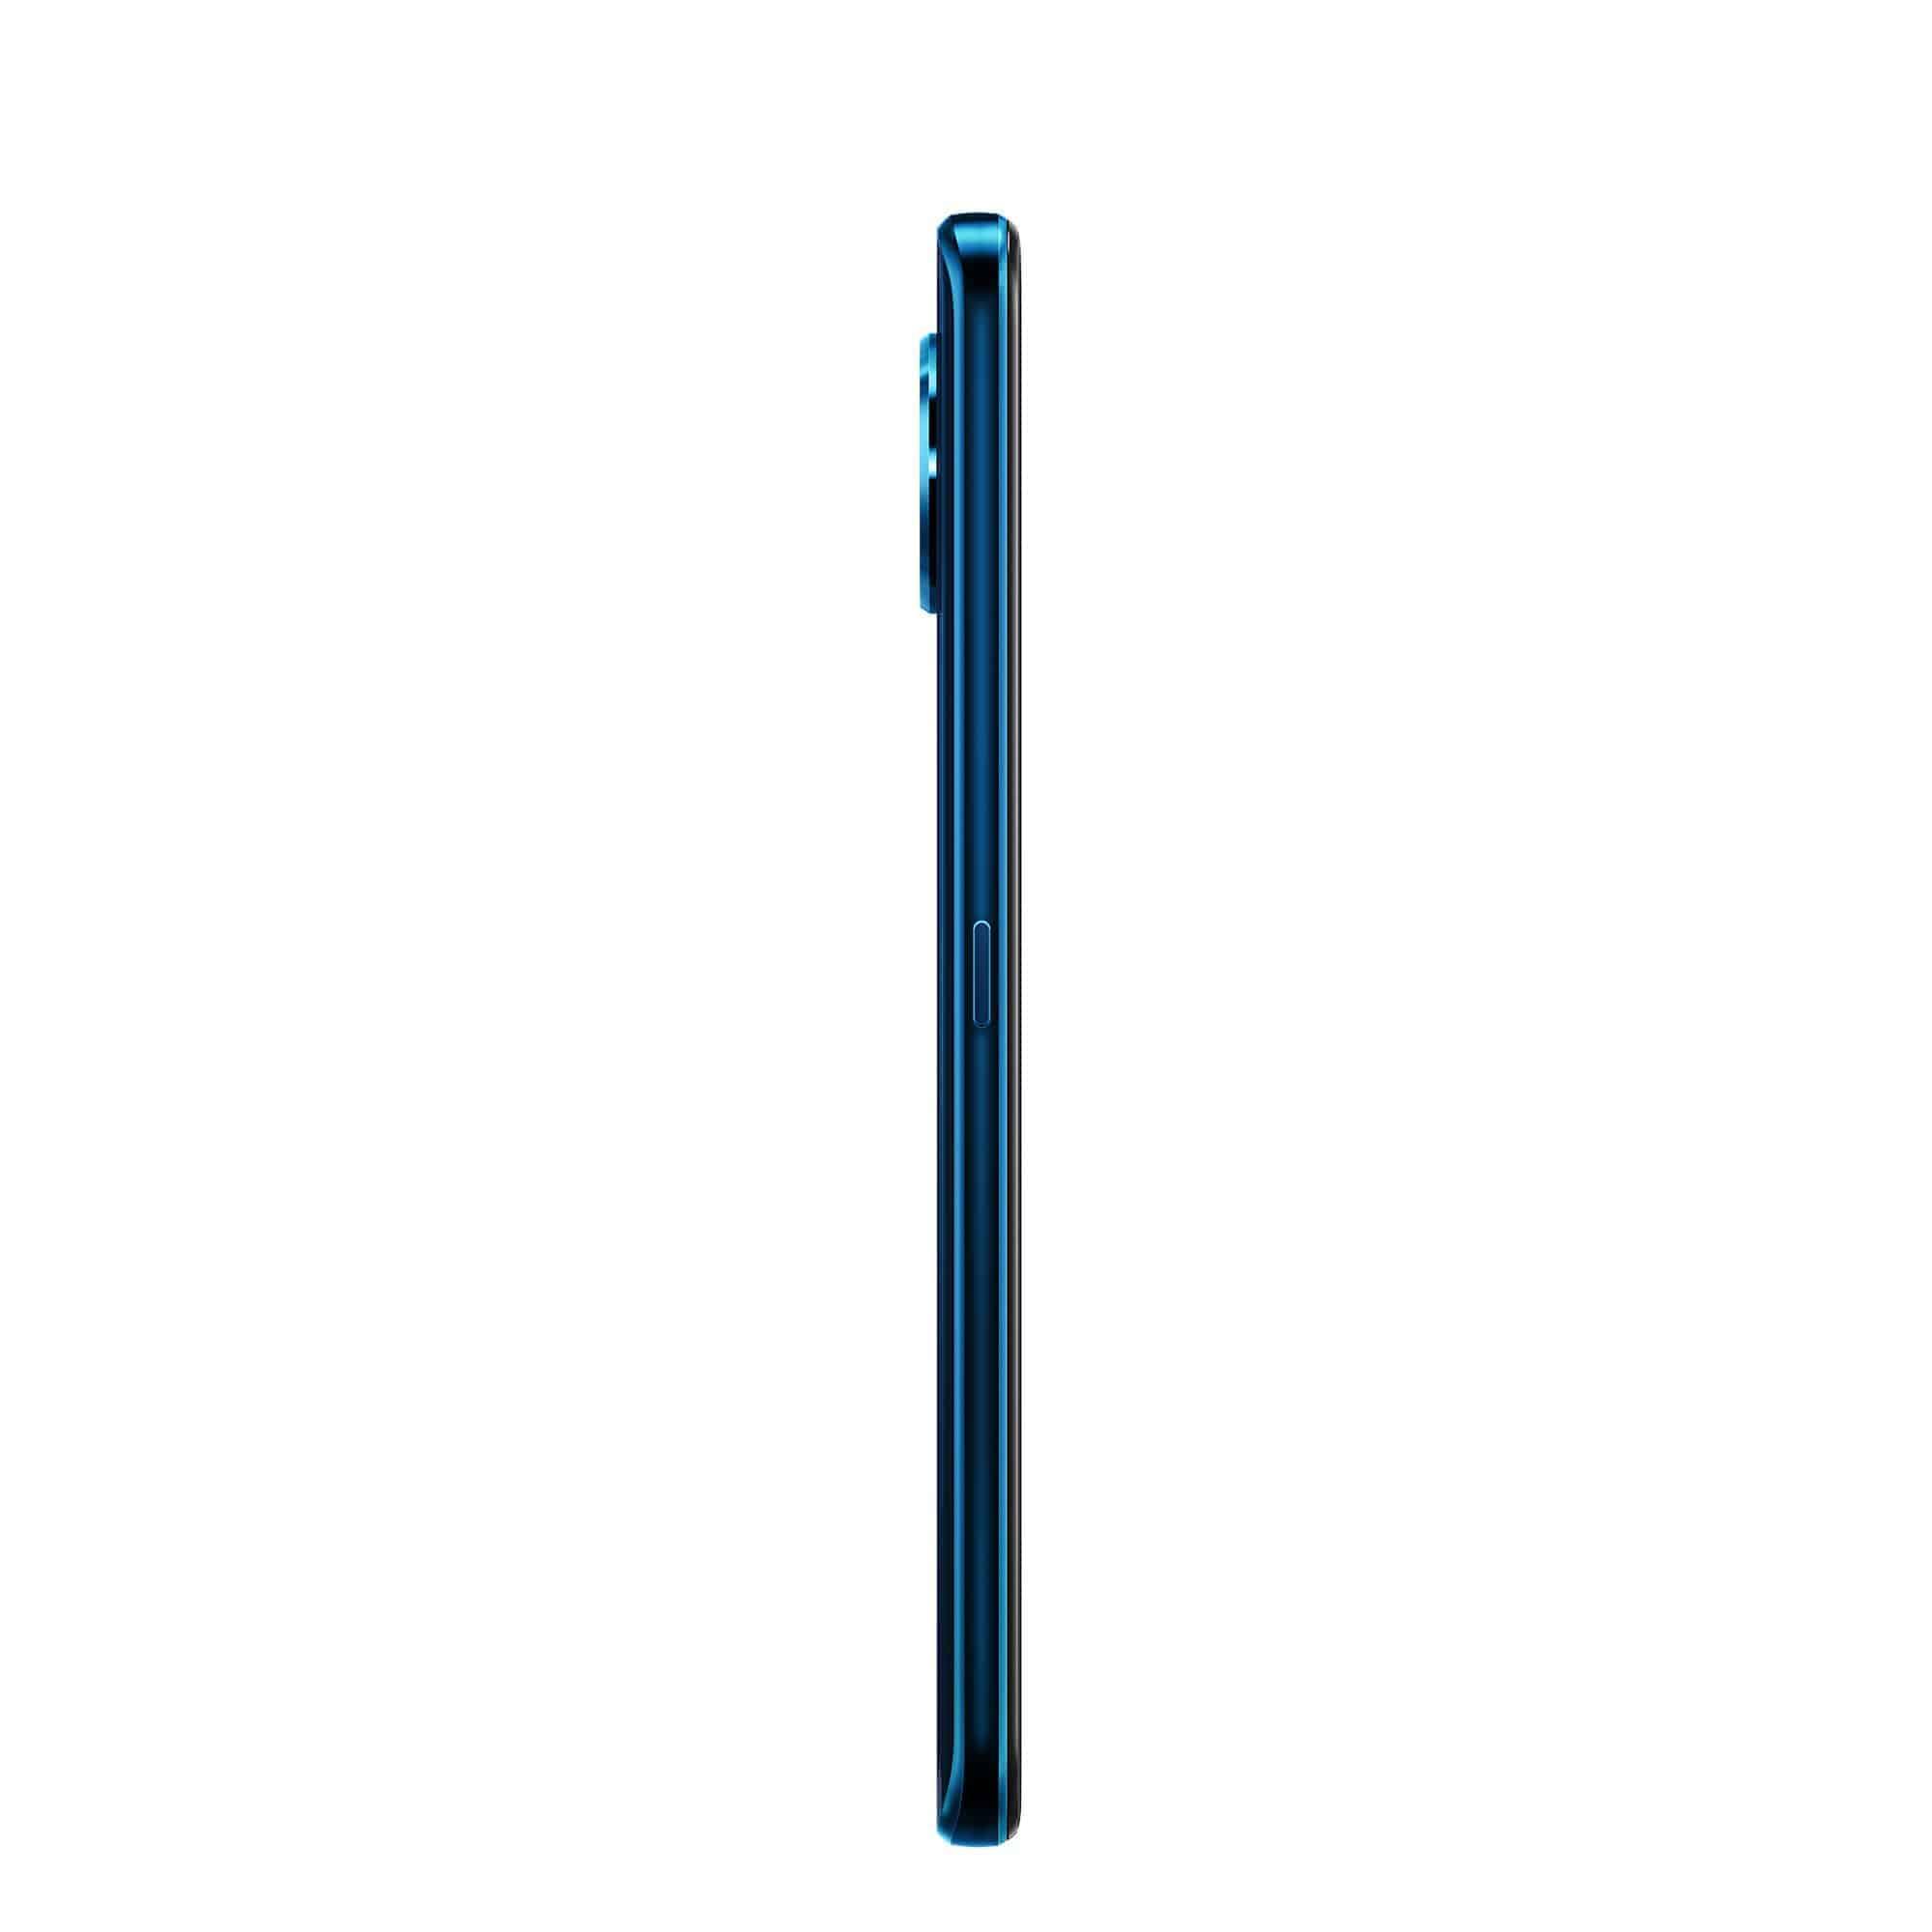 Nokia 8 3 5G image 3